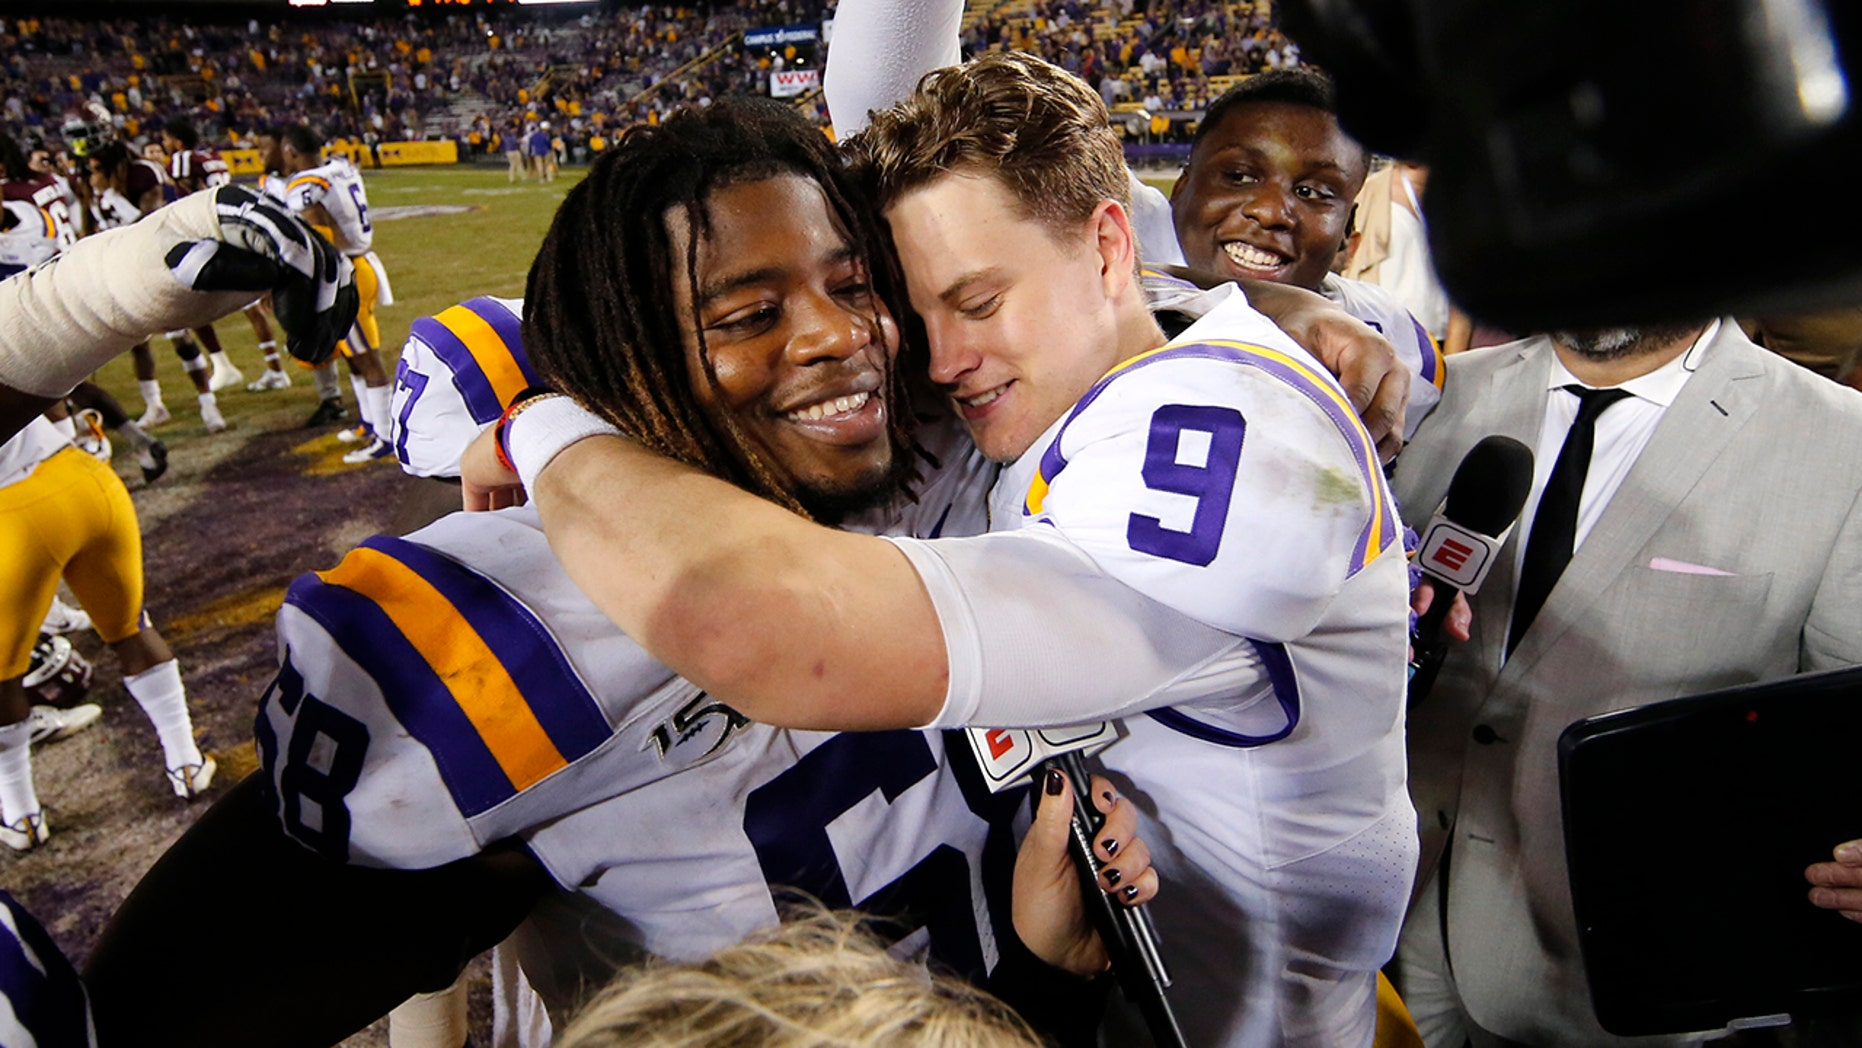 LSU quarterback Joe Burrow (9) hugs ensure Damien Lewis after a team's NCAA college football diversion opposite Texas Aamp;M in Baton Rouge, La., Saturday, Nov. 30, 2019. LSU won 50-7. (AP Photo/Gerald Herbert)